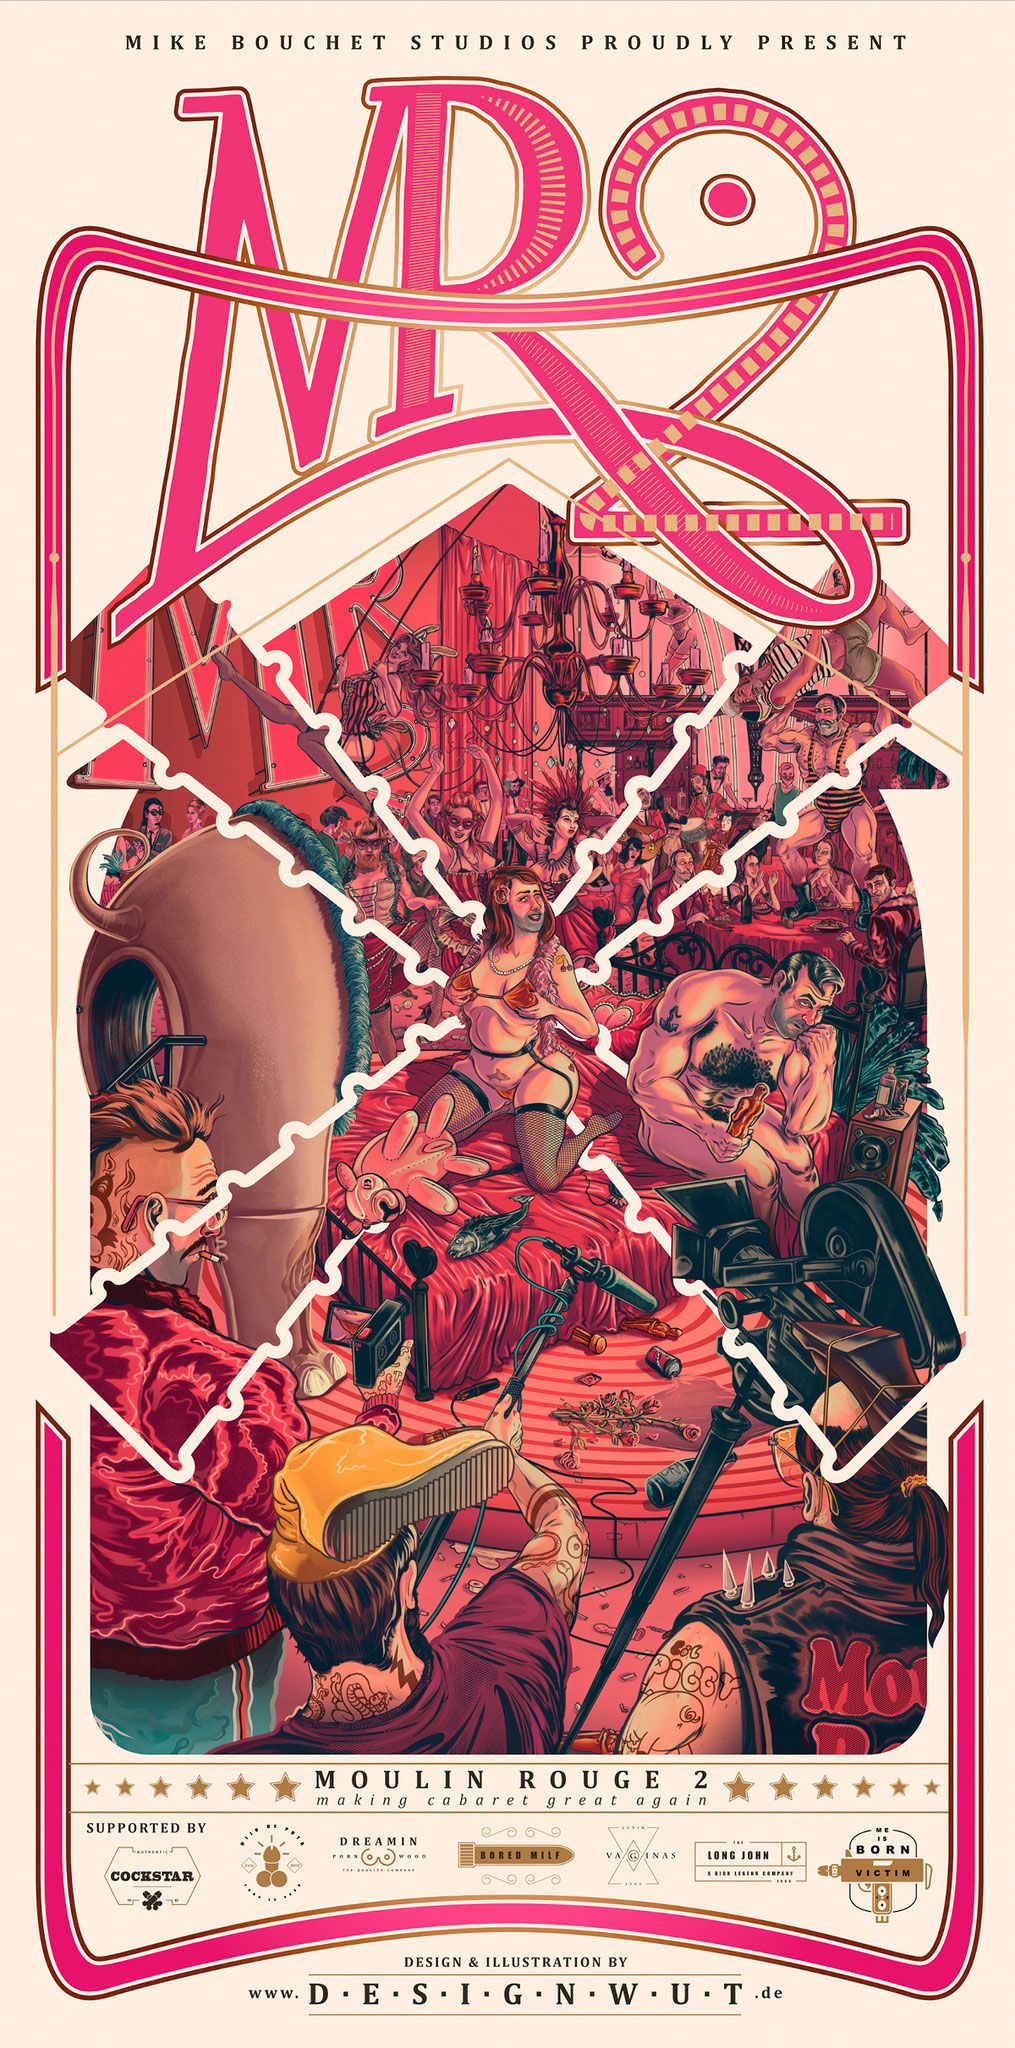 MIKE BOUCHET → Moulin Rouge 2 Poster Design